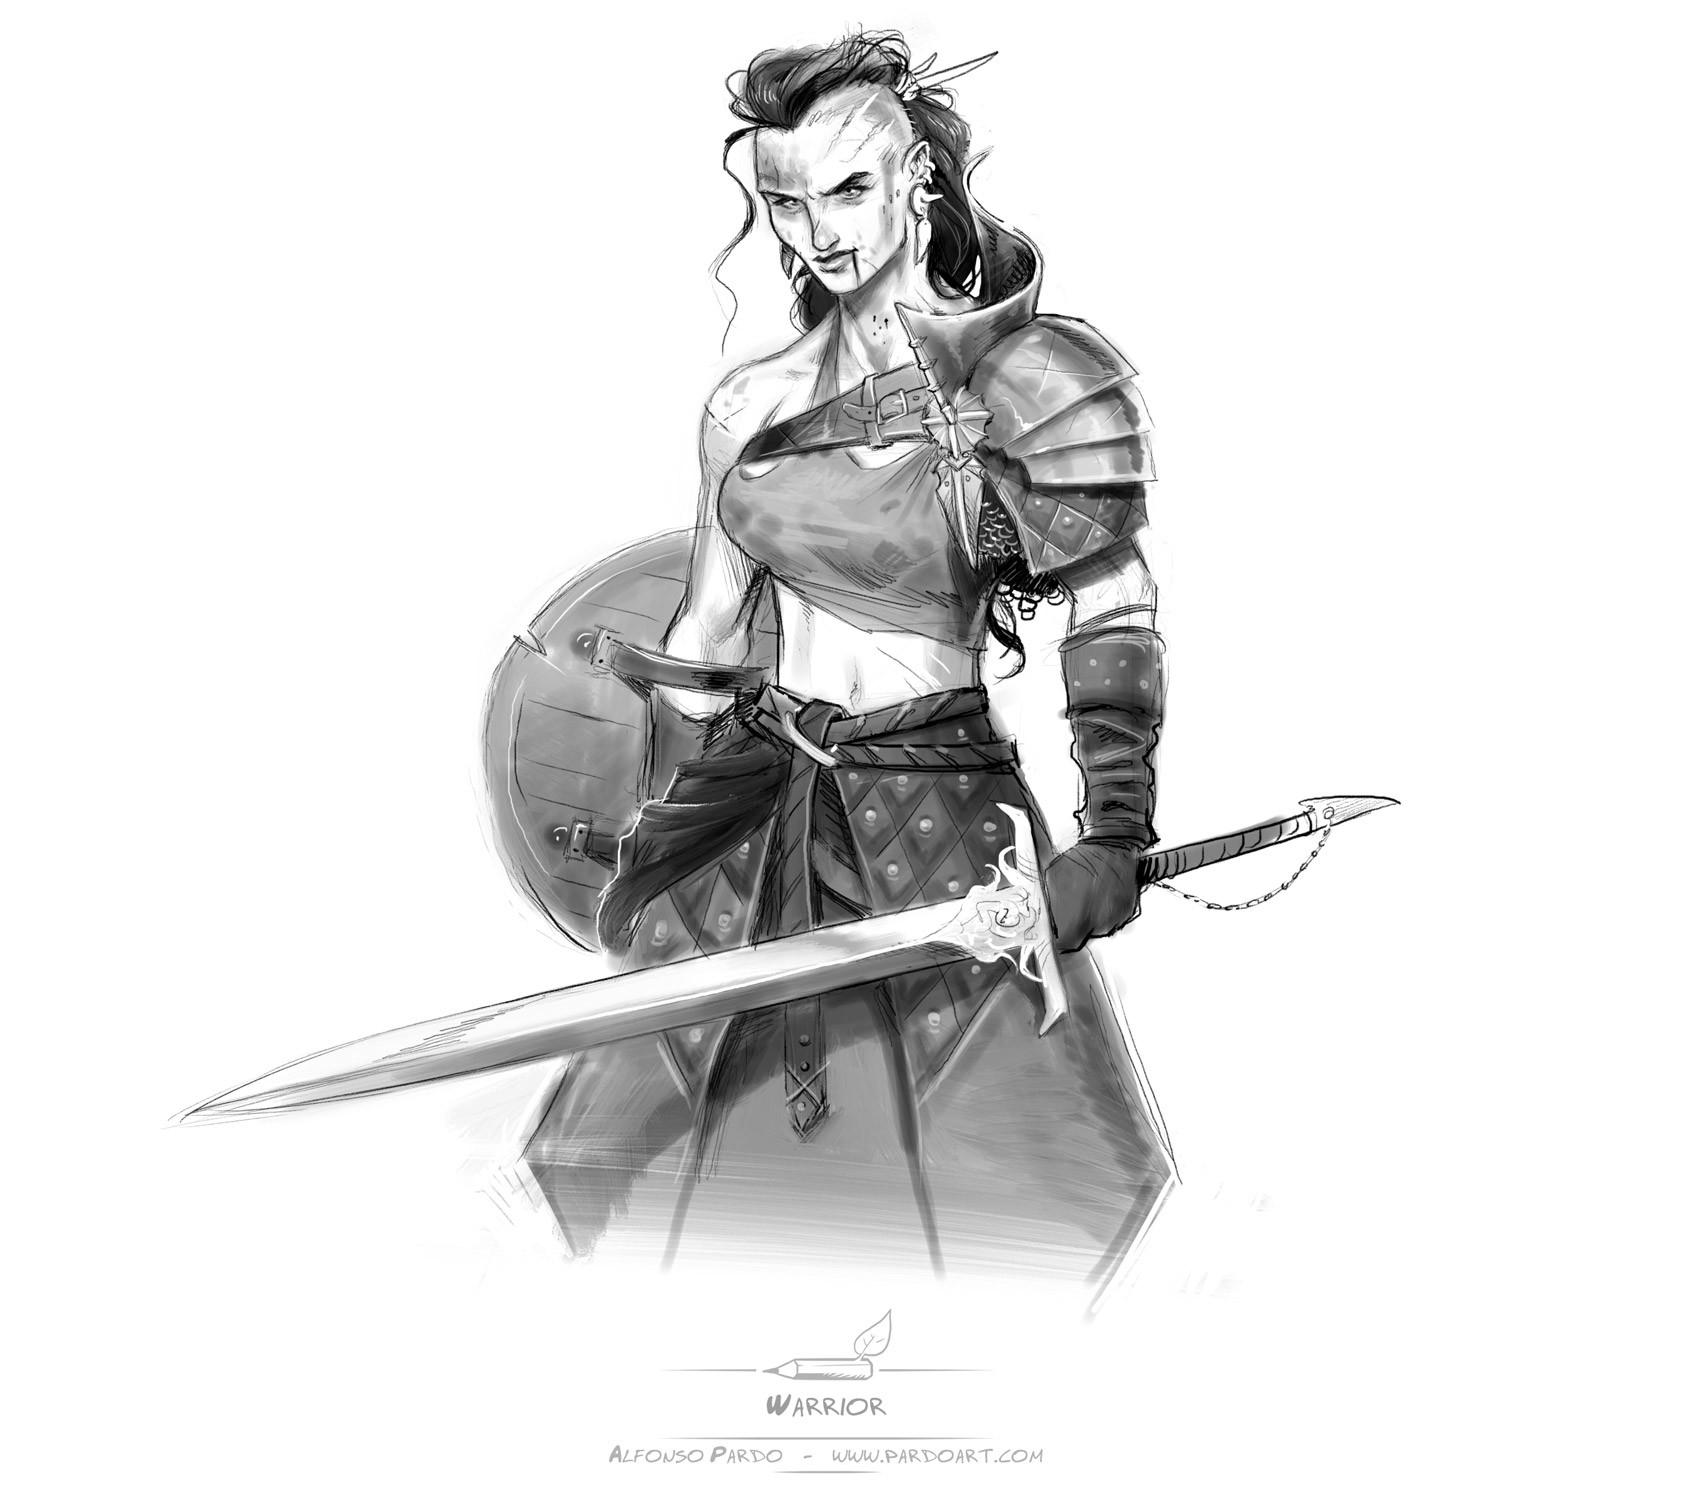 Alfonso pardo martinez warrior pardoart